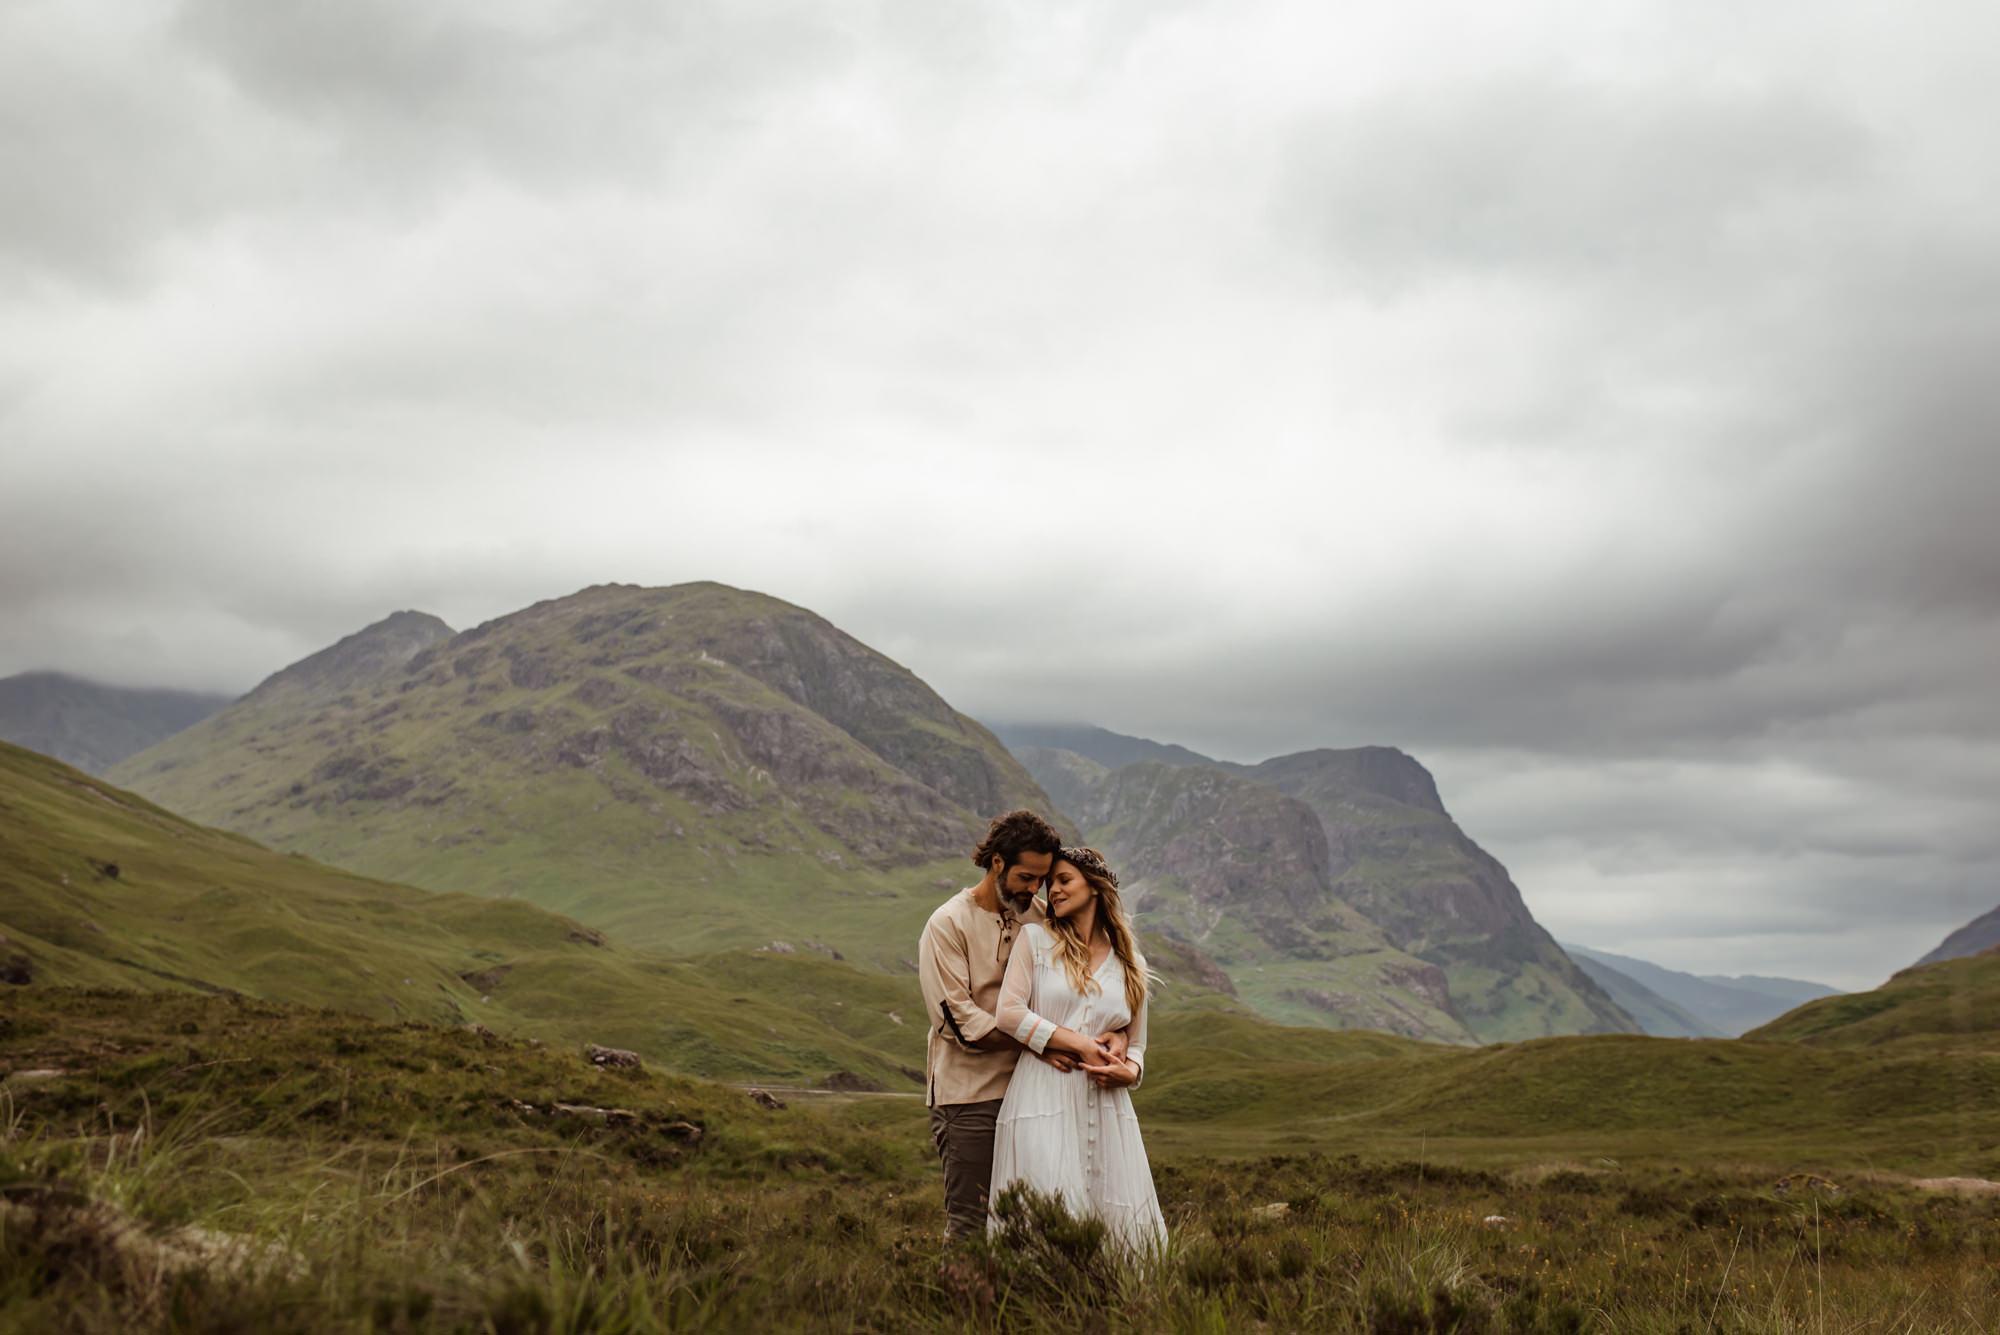 destination-wedding-photography-scotland-highlands.jpg